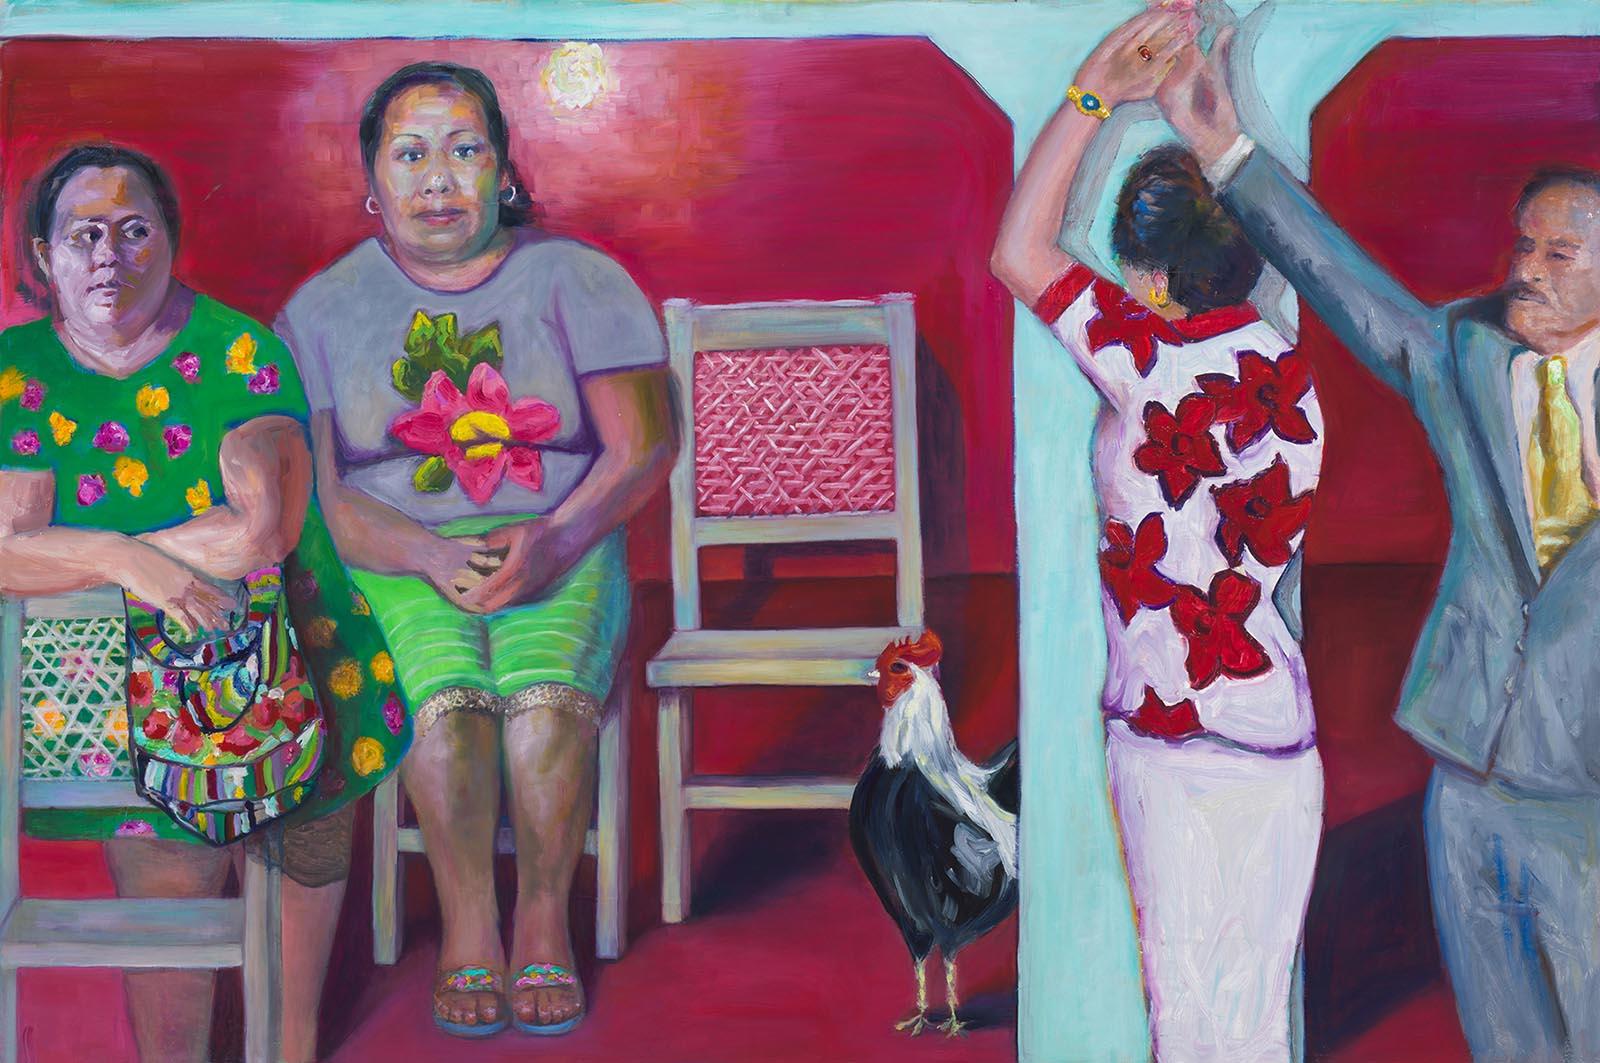 Dance by Jessica Alazraki, 2016, Oil on Canvas, 48x70 inches, for sale